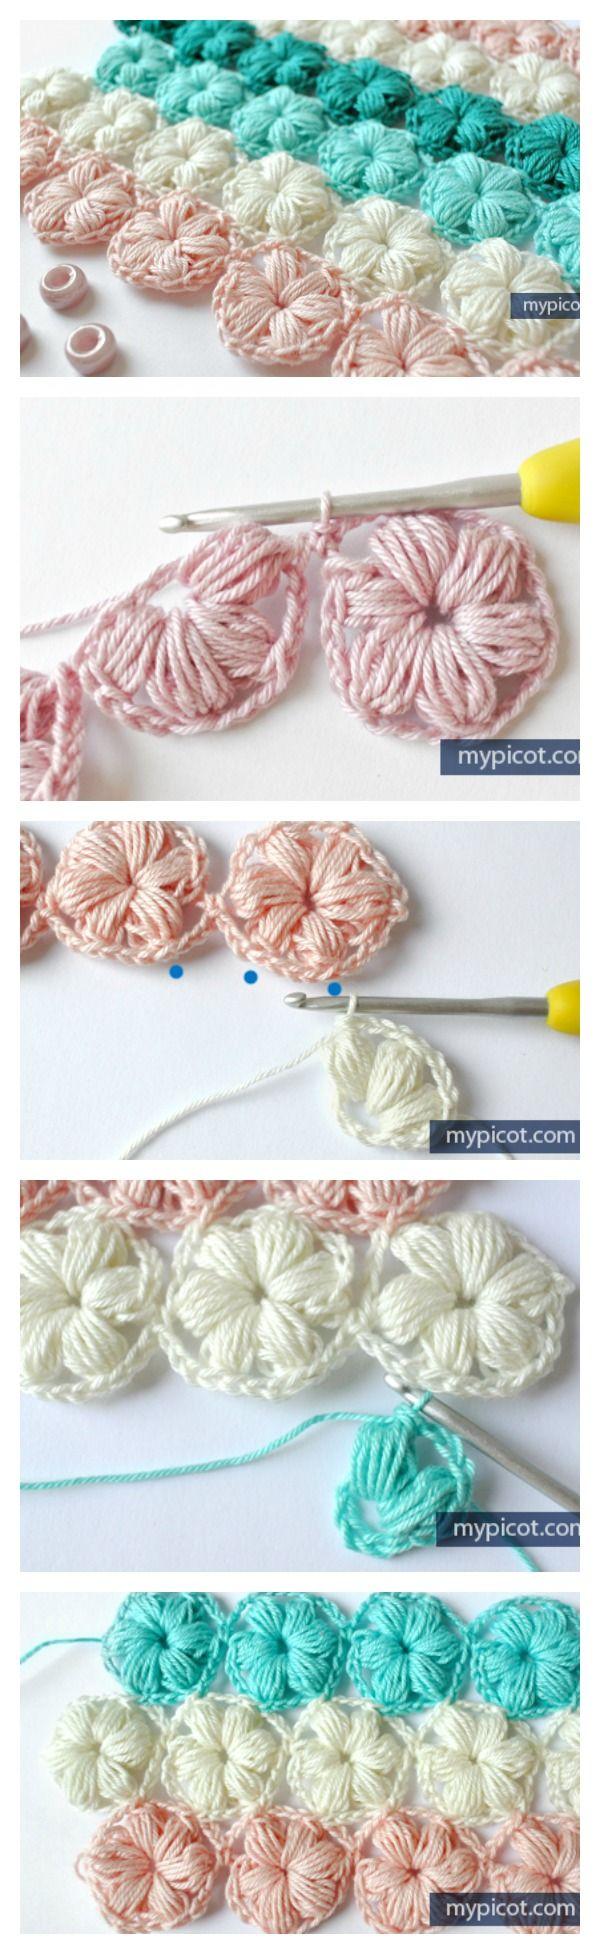 Beautiful Puff Stitch Patterns I Can't Wait To Try